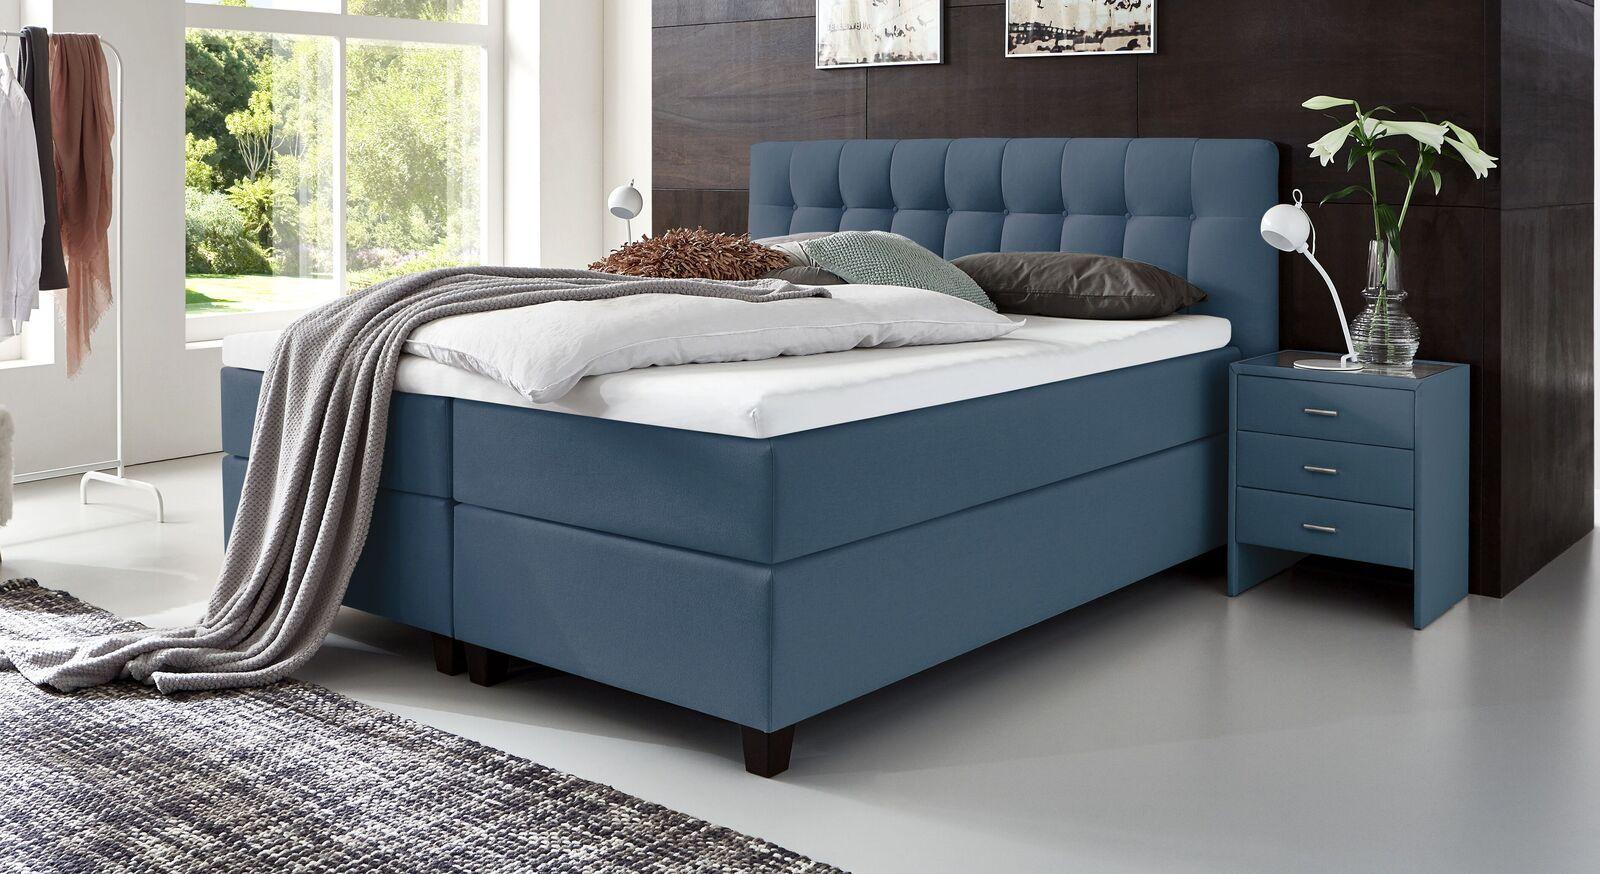 Trendiges Boxspringbett Luciano aus blauem Webstoff in Komforthöhe